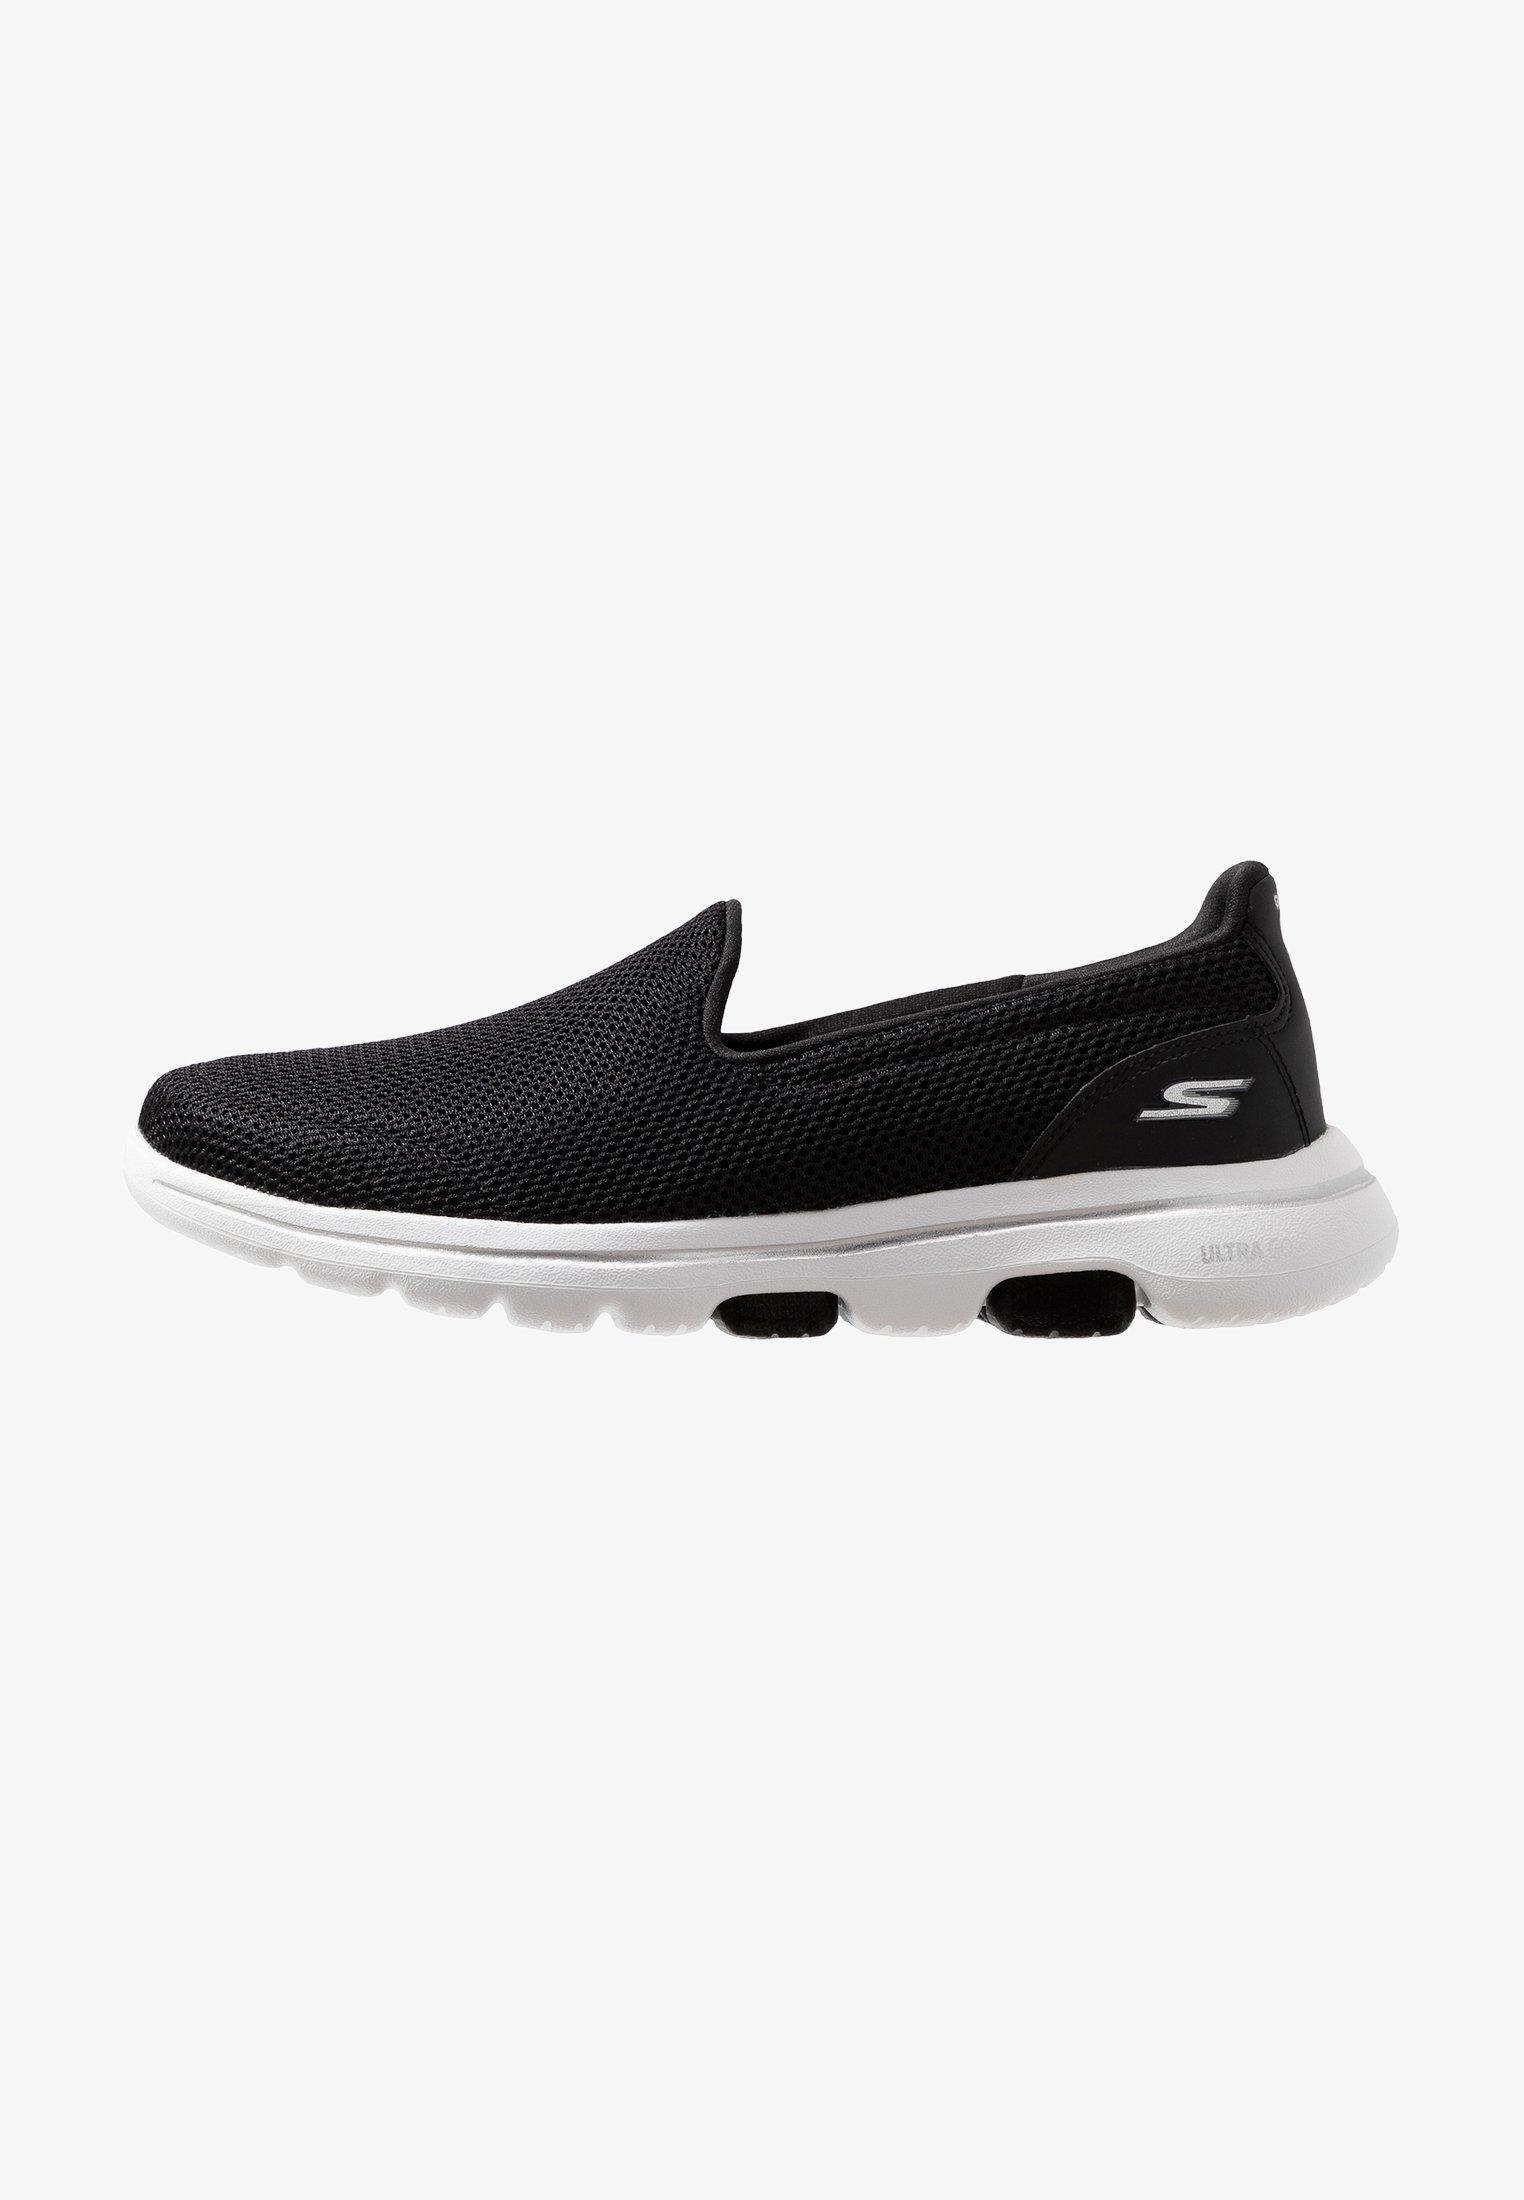 Alinear Actual Domar  Skechers Performance GO WALK 5 - Zapatillas para caminar -  black/white/negro - Zalando.es